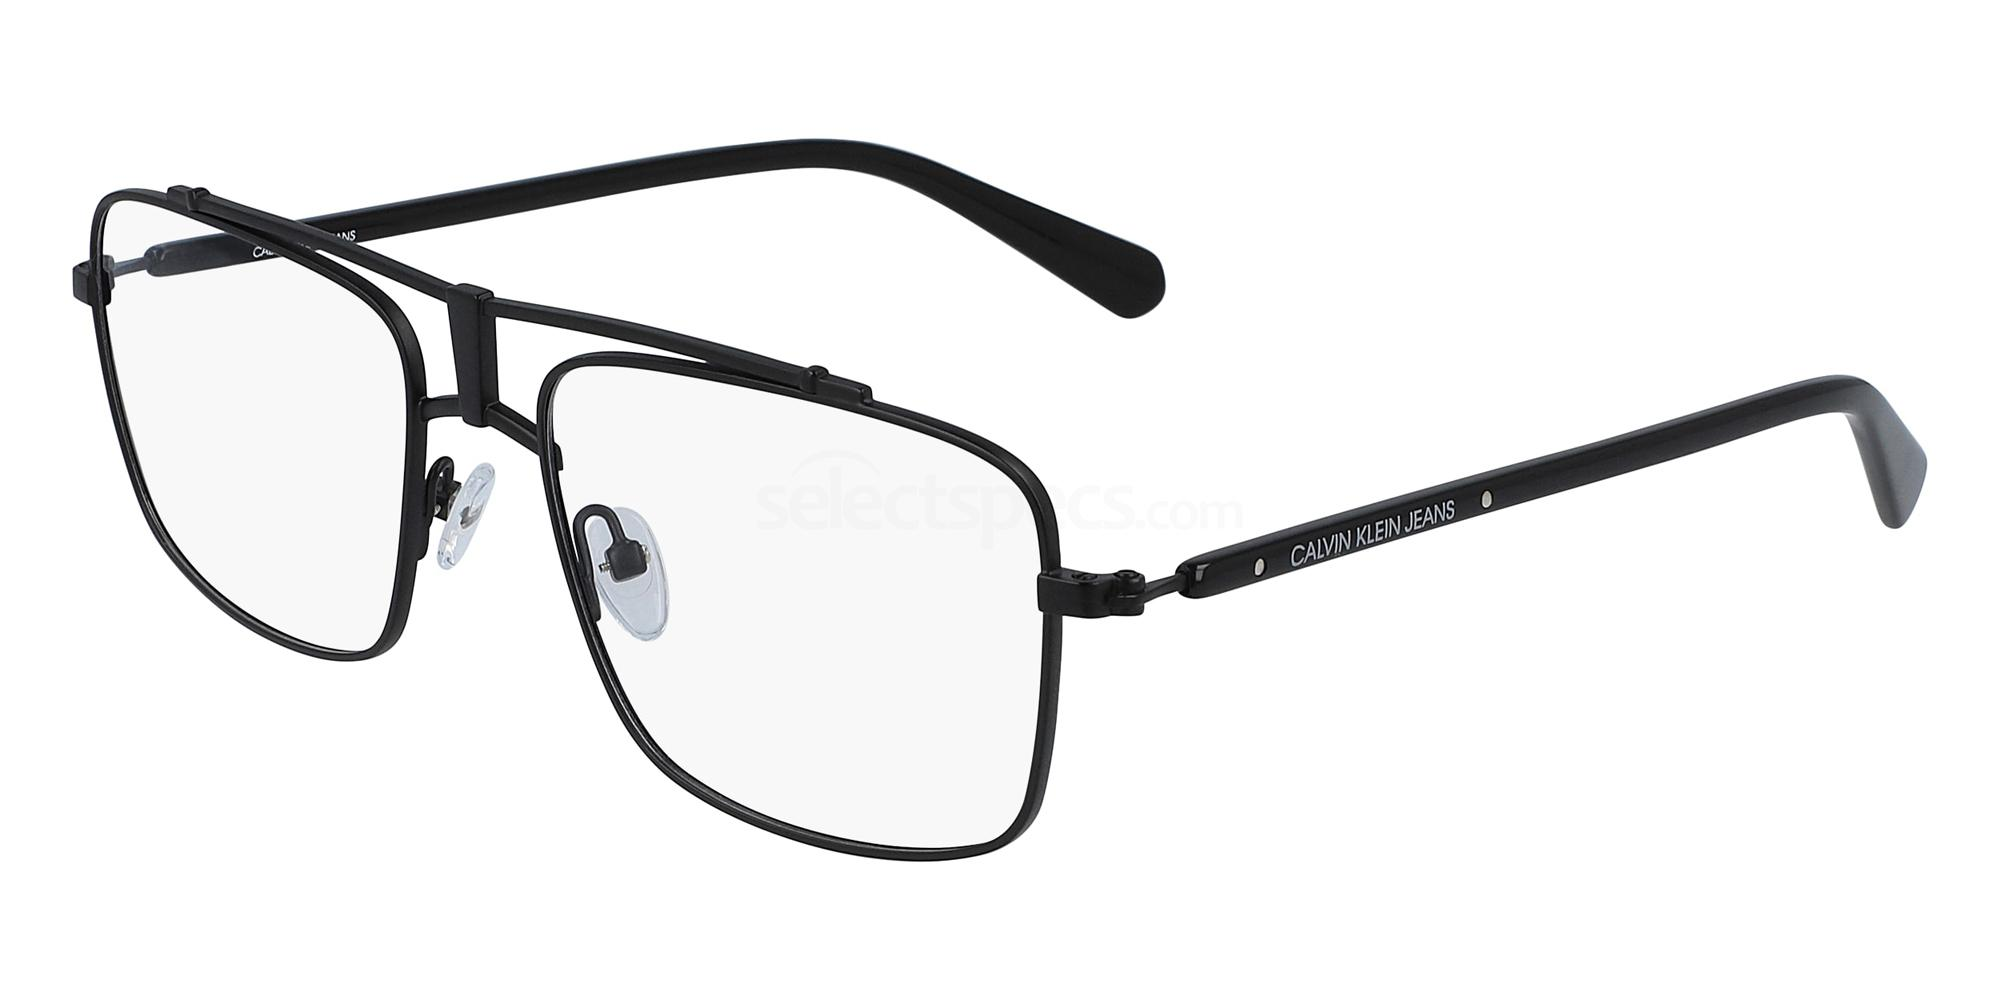 001 CKJ19311 Glasses, Calvin Klein Jeans